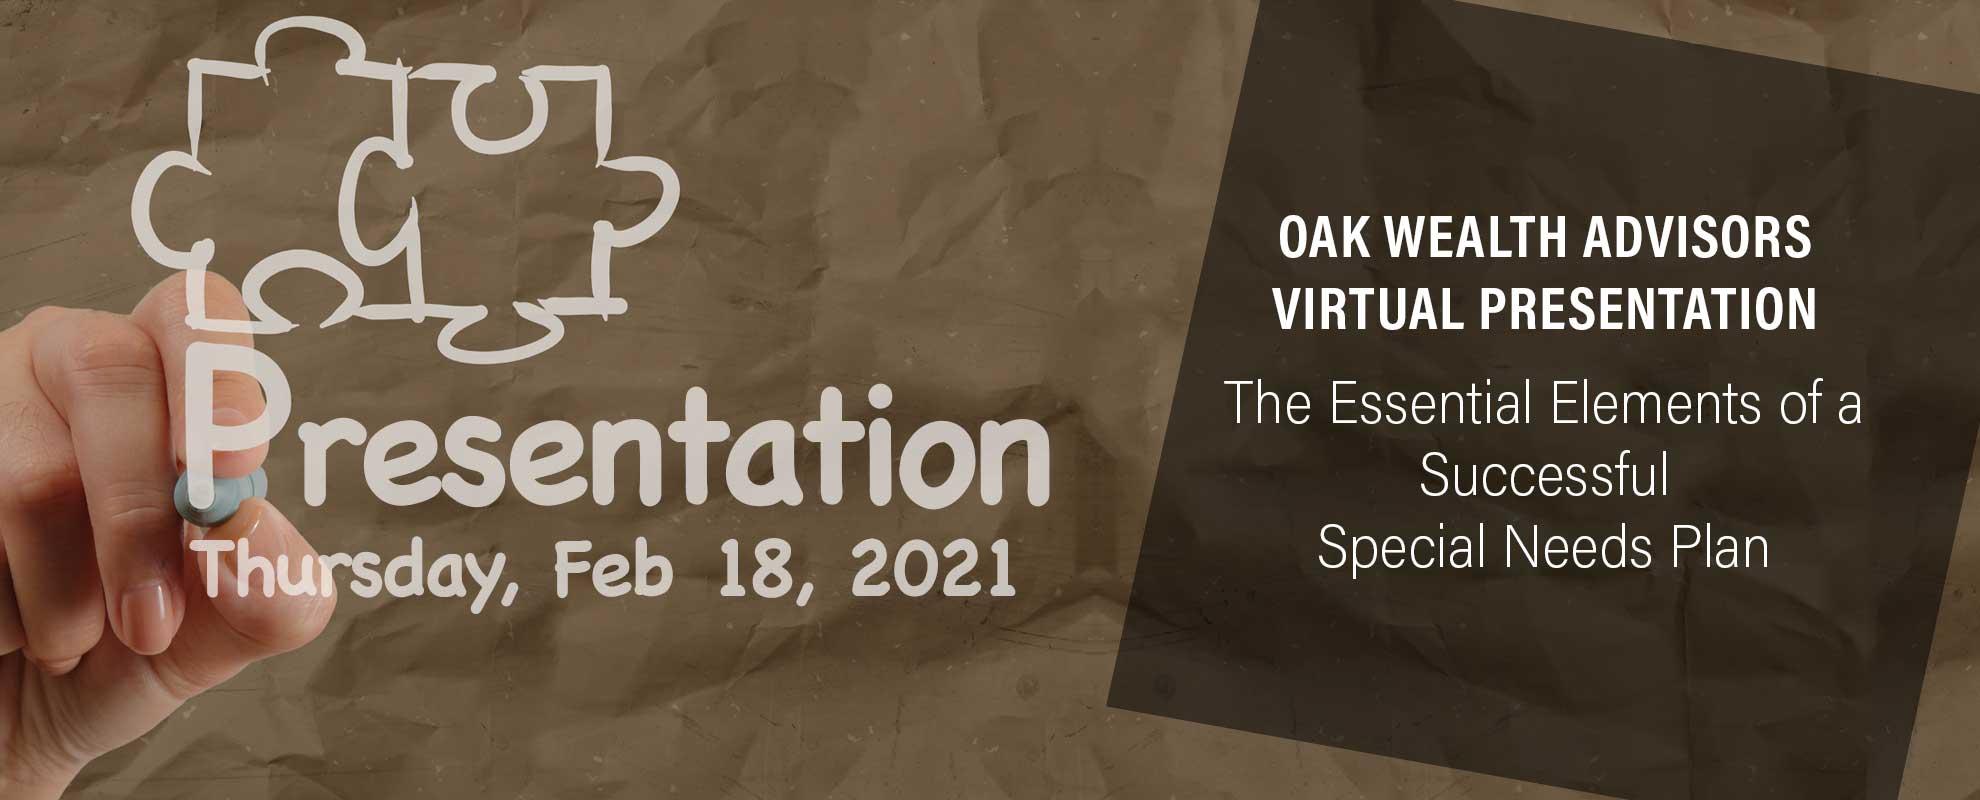 Special-Needs-Presentation-Feb182021-b